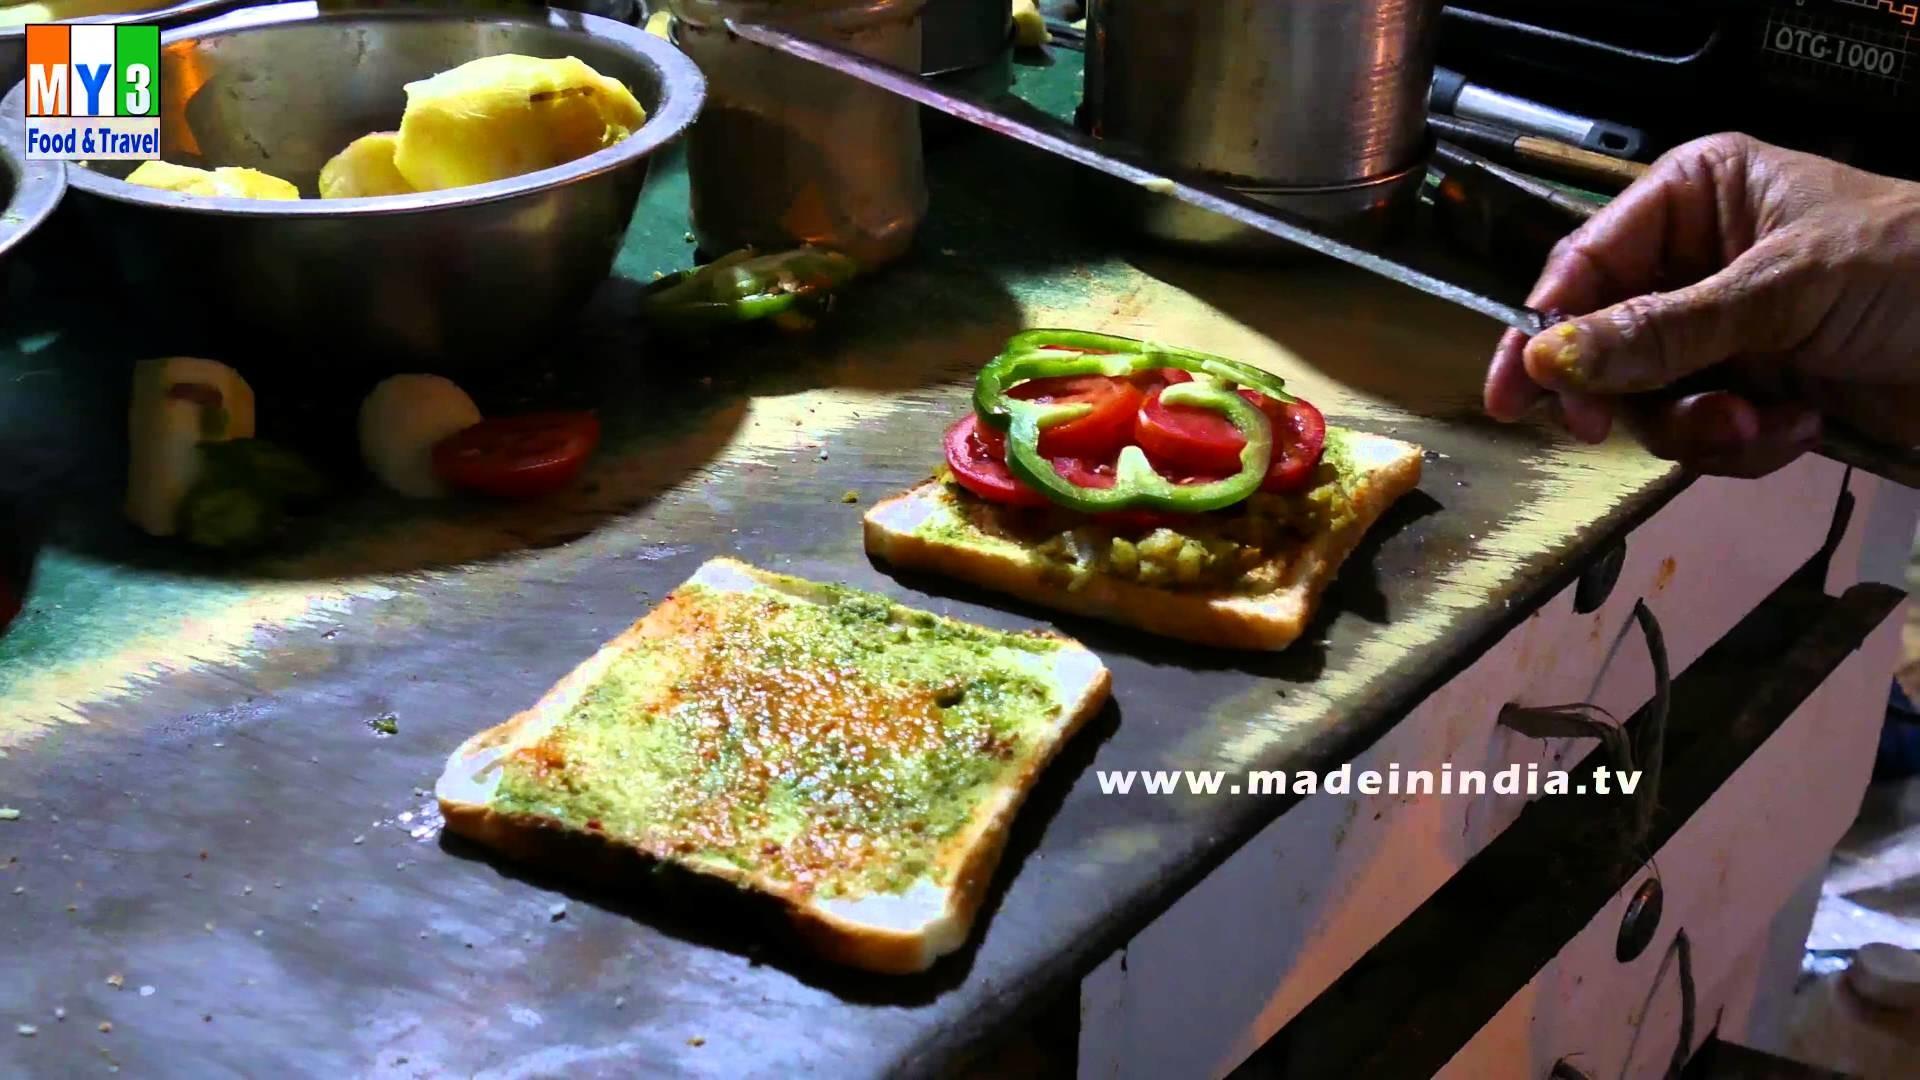 HOW TO MAKE Veg Sandwich | MUMBAI STREET FOOD | 4K VIDEO